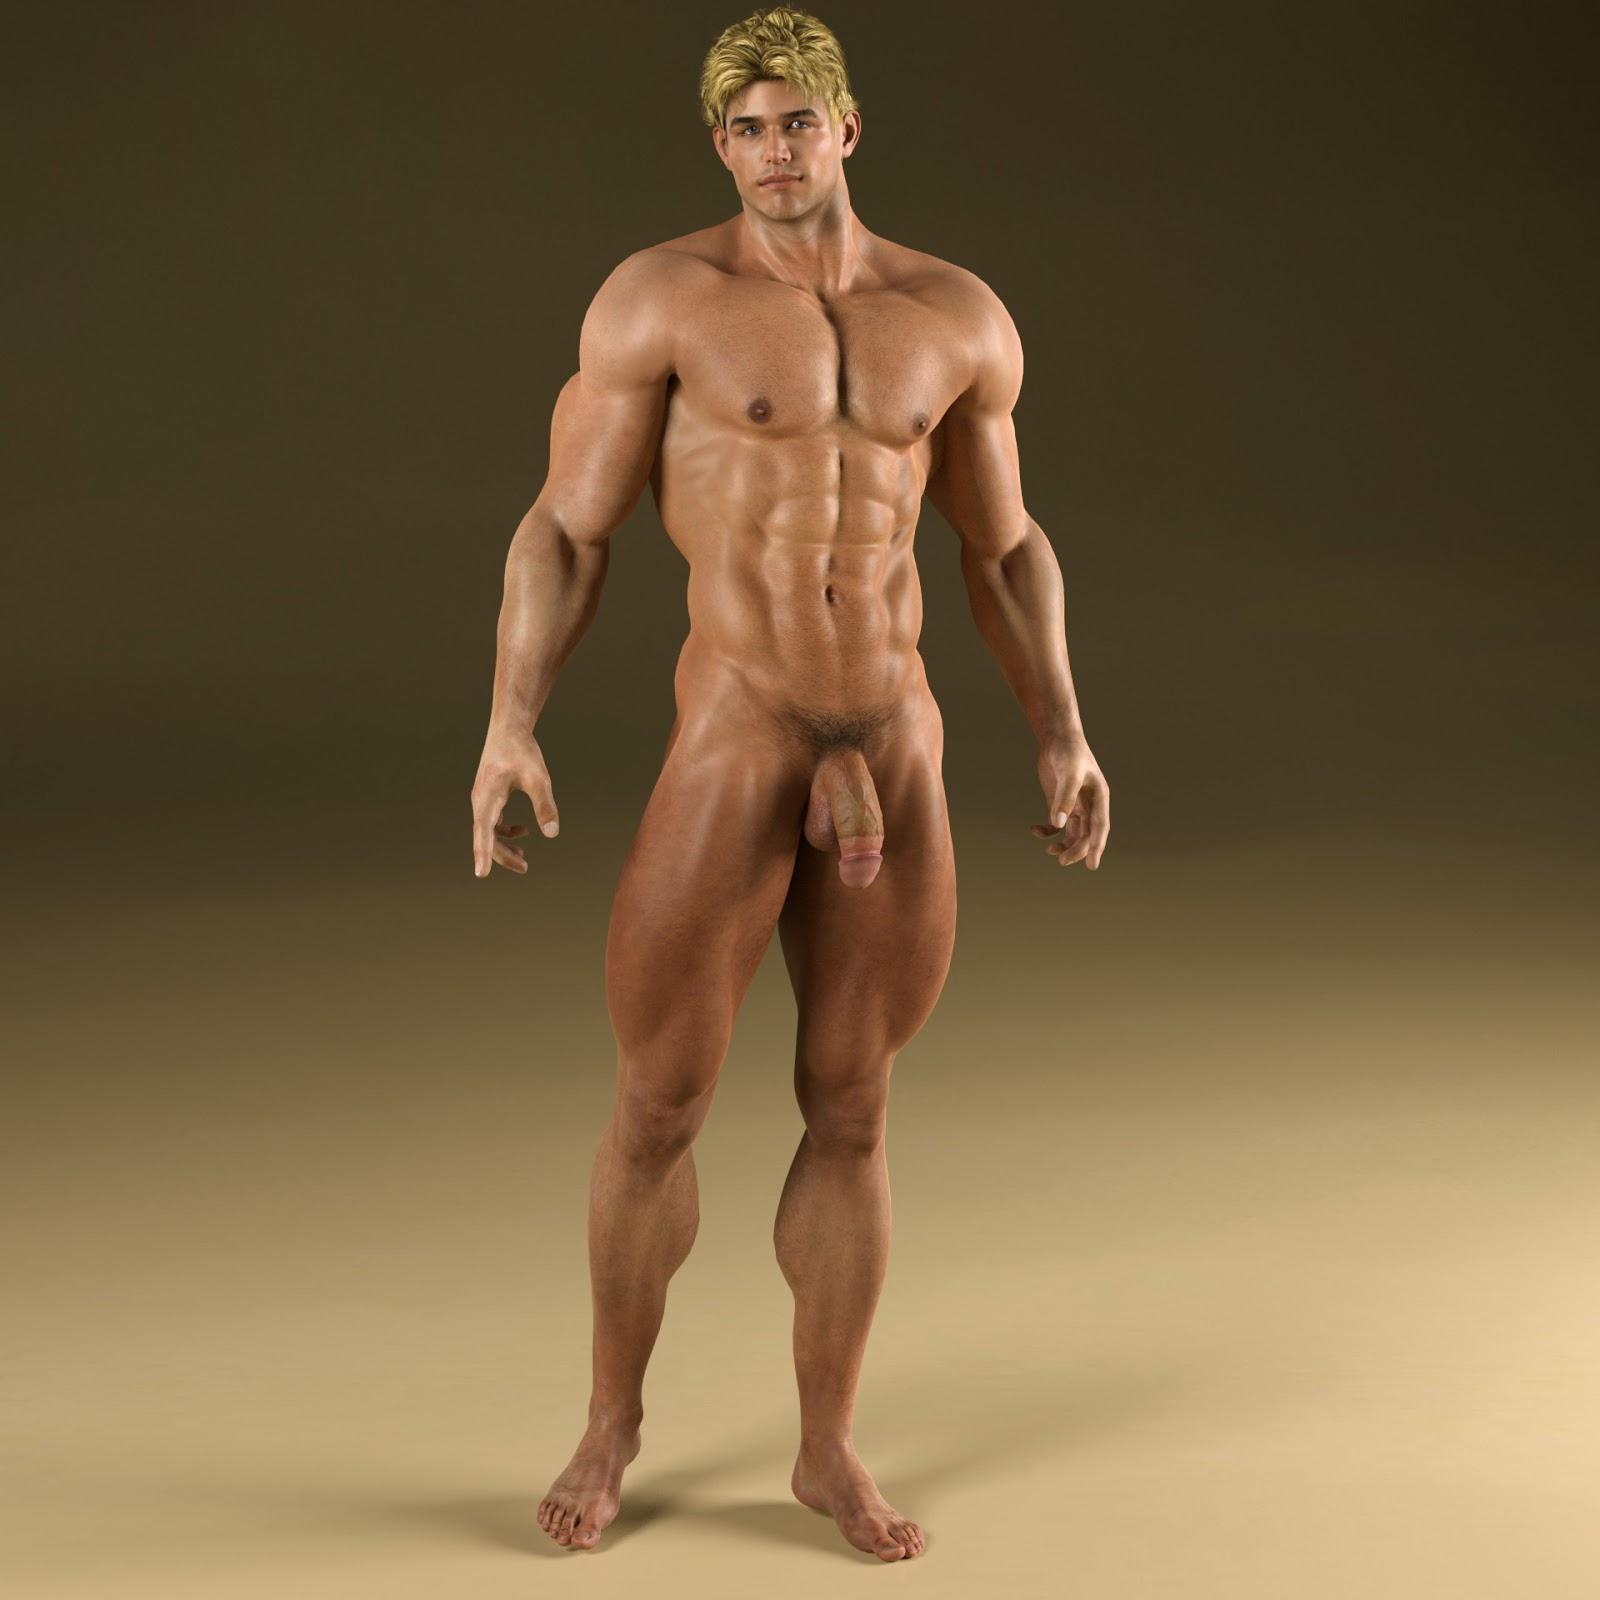 Provocative Wave For Men Super Heros Nude-1220